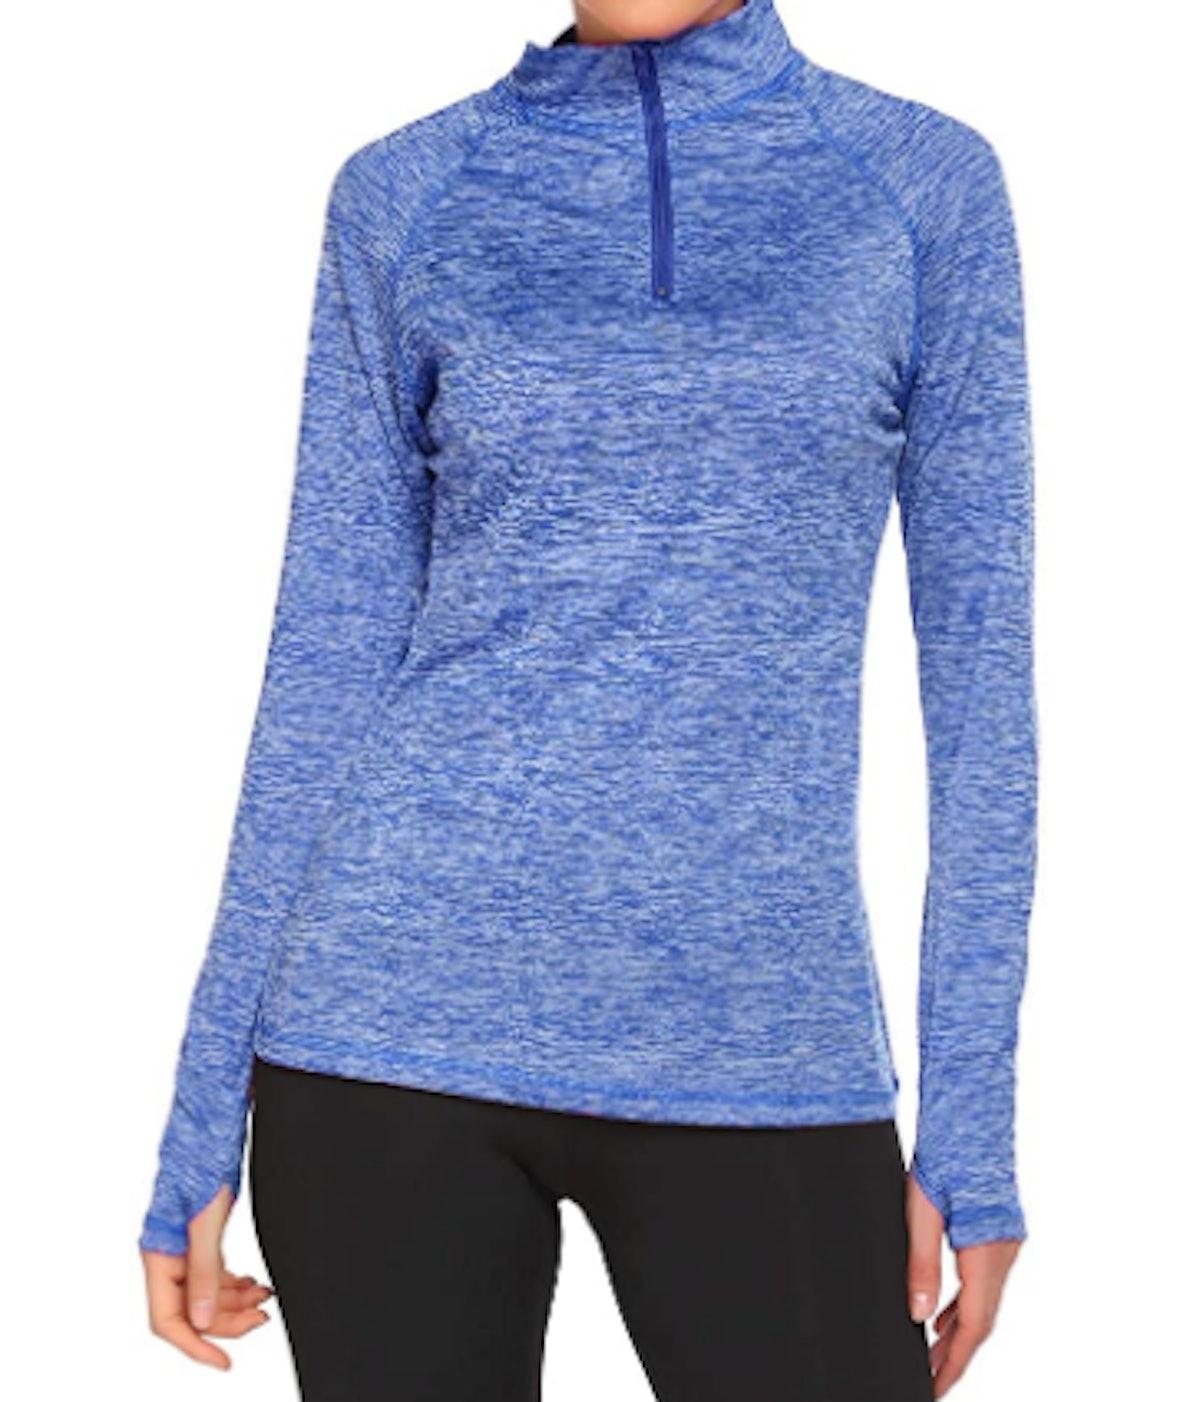 Elesol Half-Zip Pullover Workout Shirt